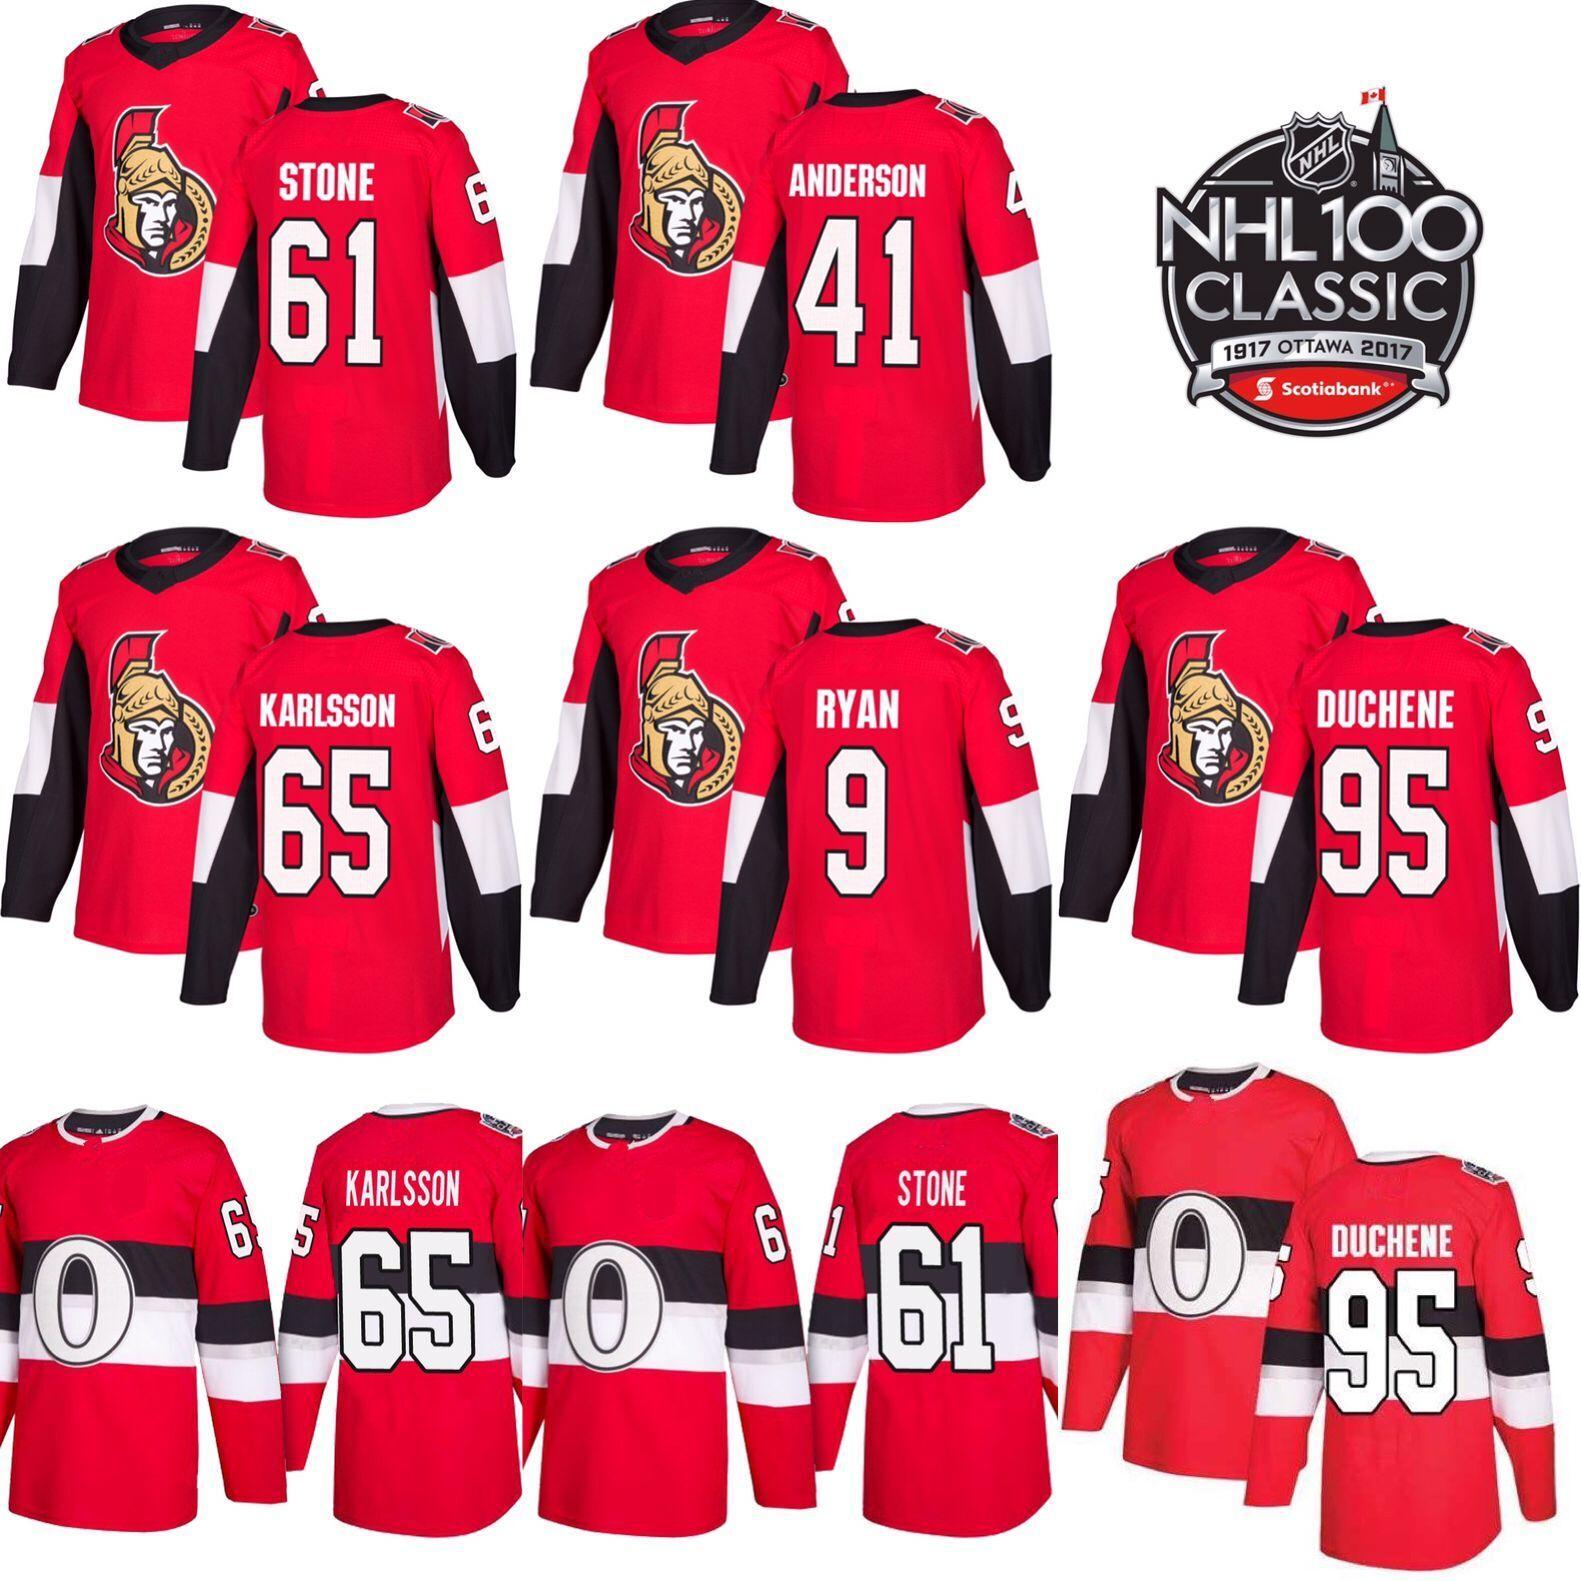 2019 2019 Ottawa Senators New Mens 100th Classic 65 Erik Karlsson 95 Matt  Duchene 61 Mark Stone 41 Anderson Hockey Jerseys Stiched From  Jerseydhgatecom f9627f1be